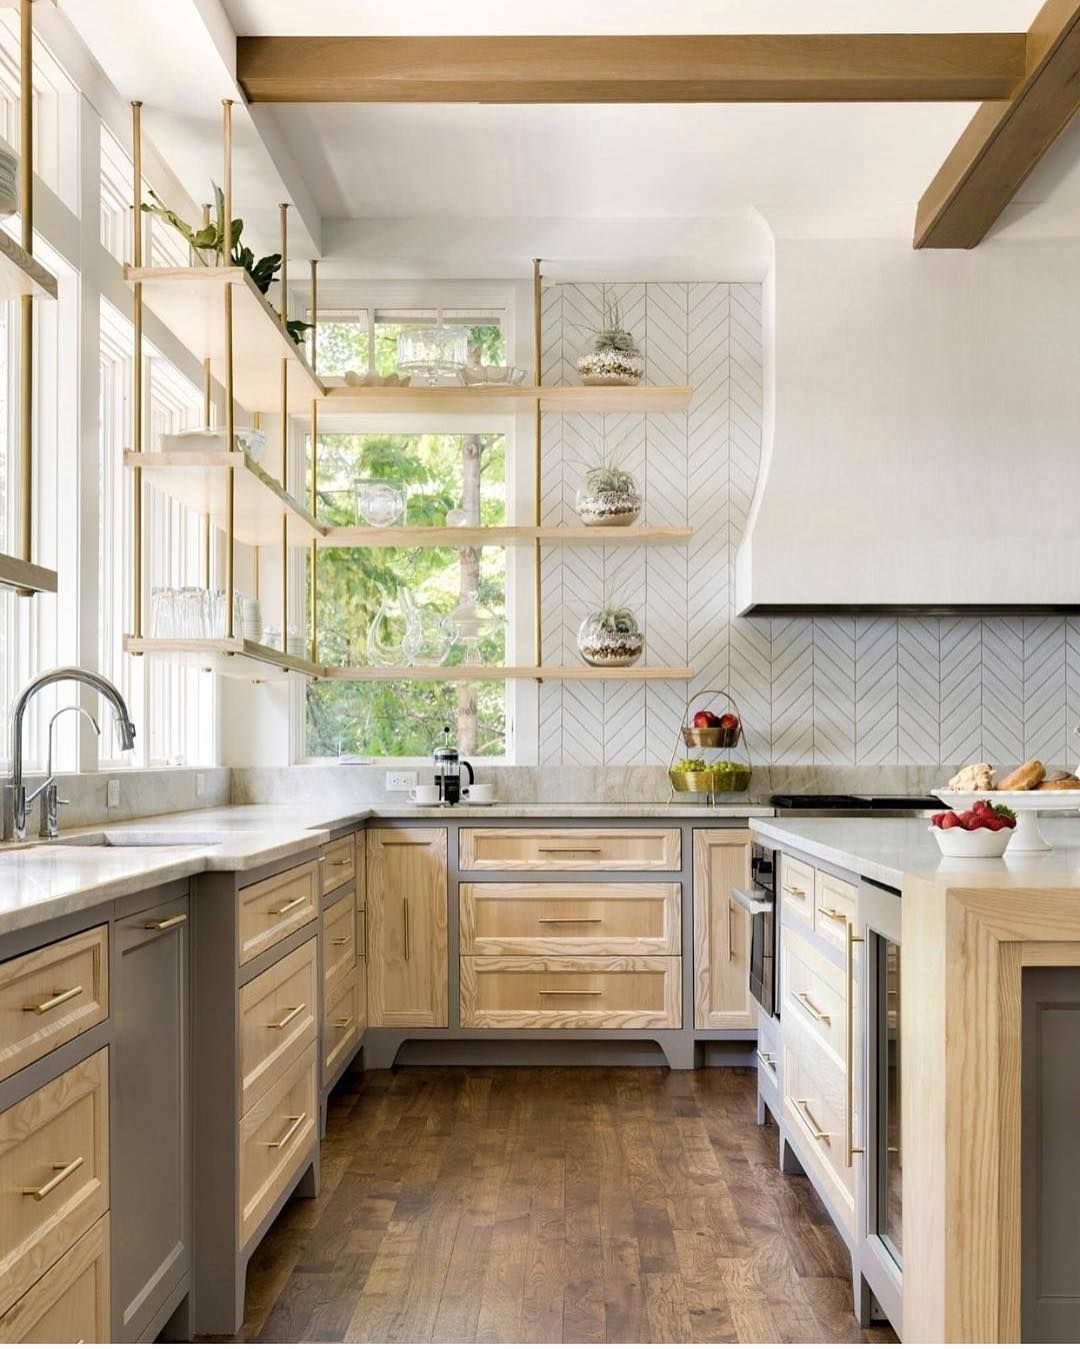 This Is Incredible From Kroissdevelopment Granitequartzdesig Thetypzeegypzee Thetypzeegypz Interior Design Kitchen Kitchen Interior Kitchen Inspirations